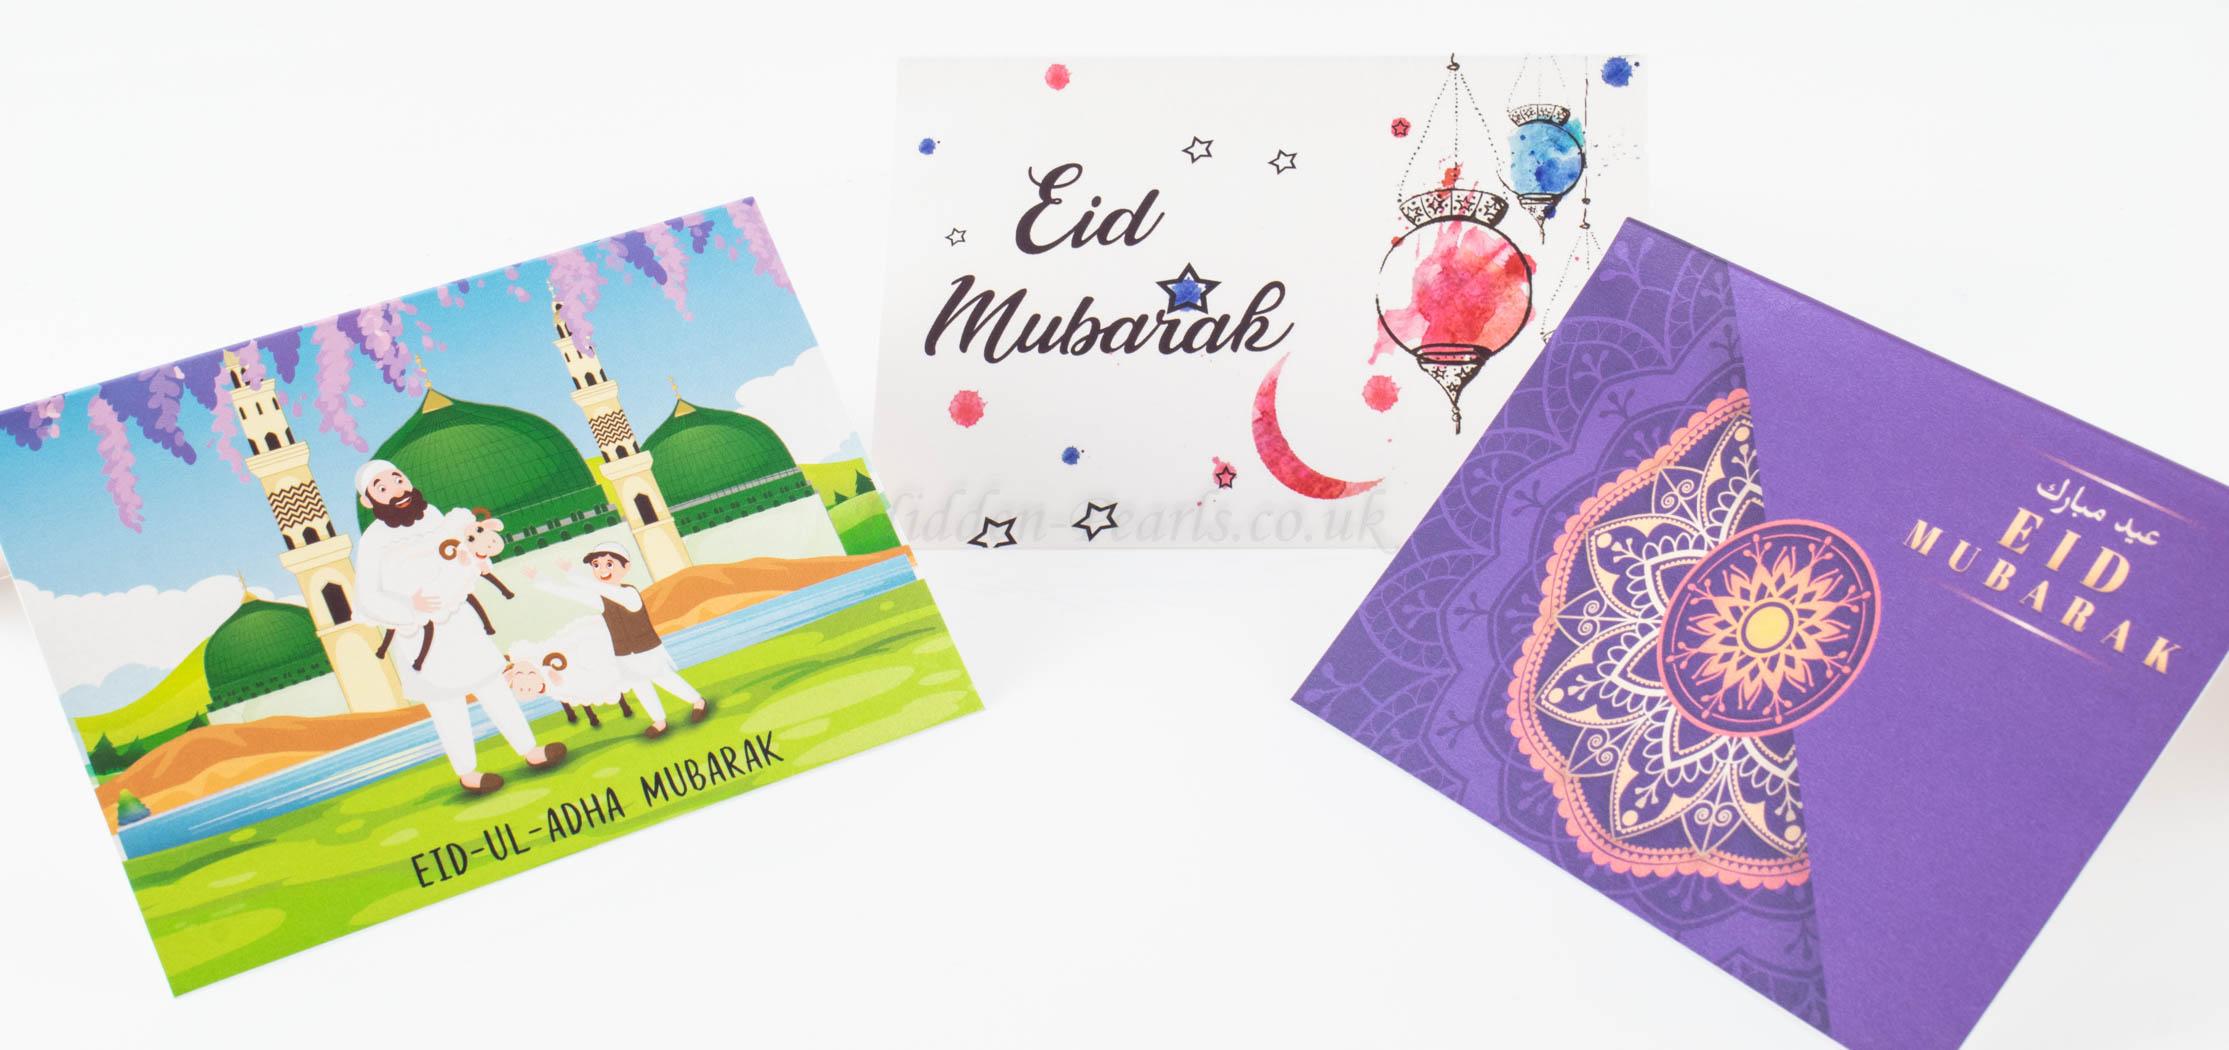 eiduladha family card » hidden pearls